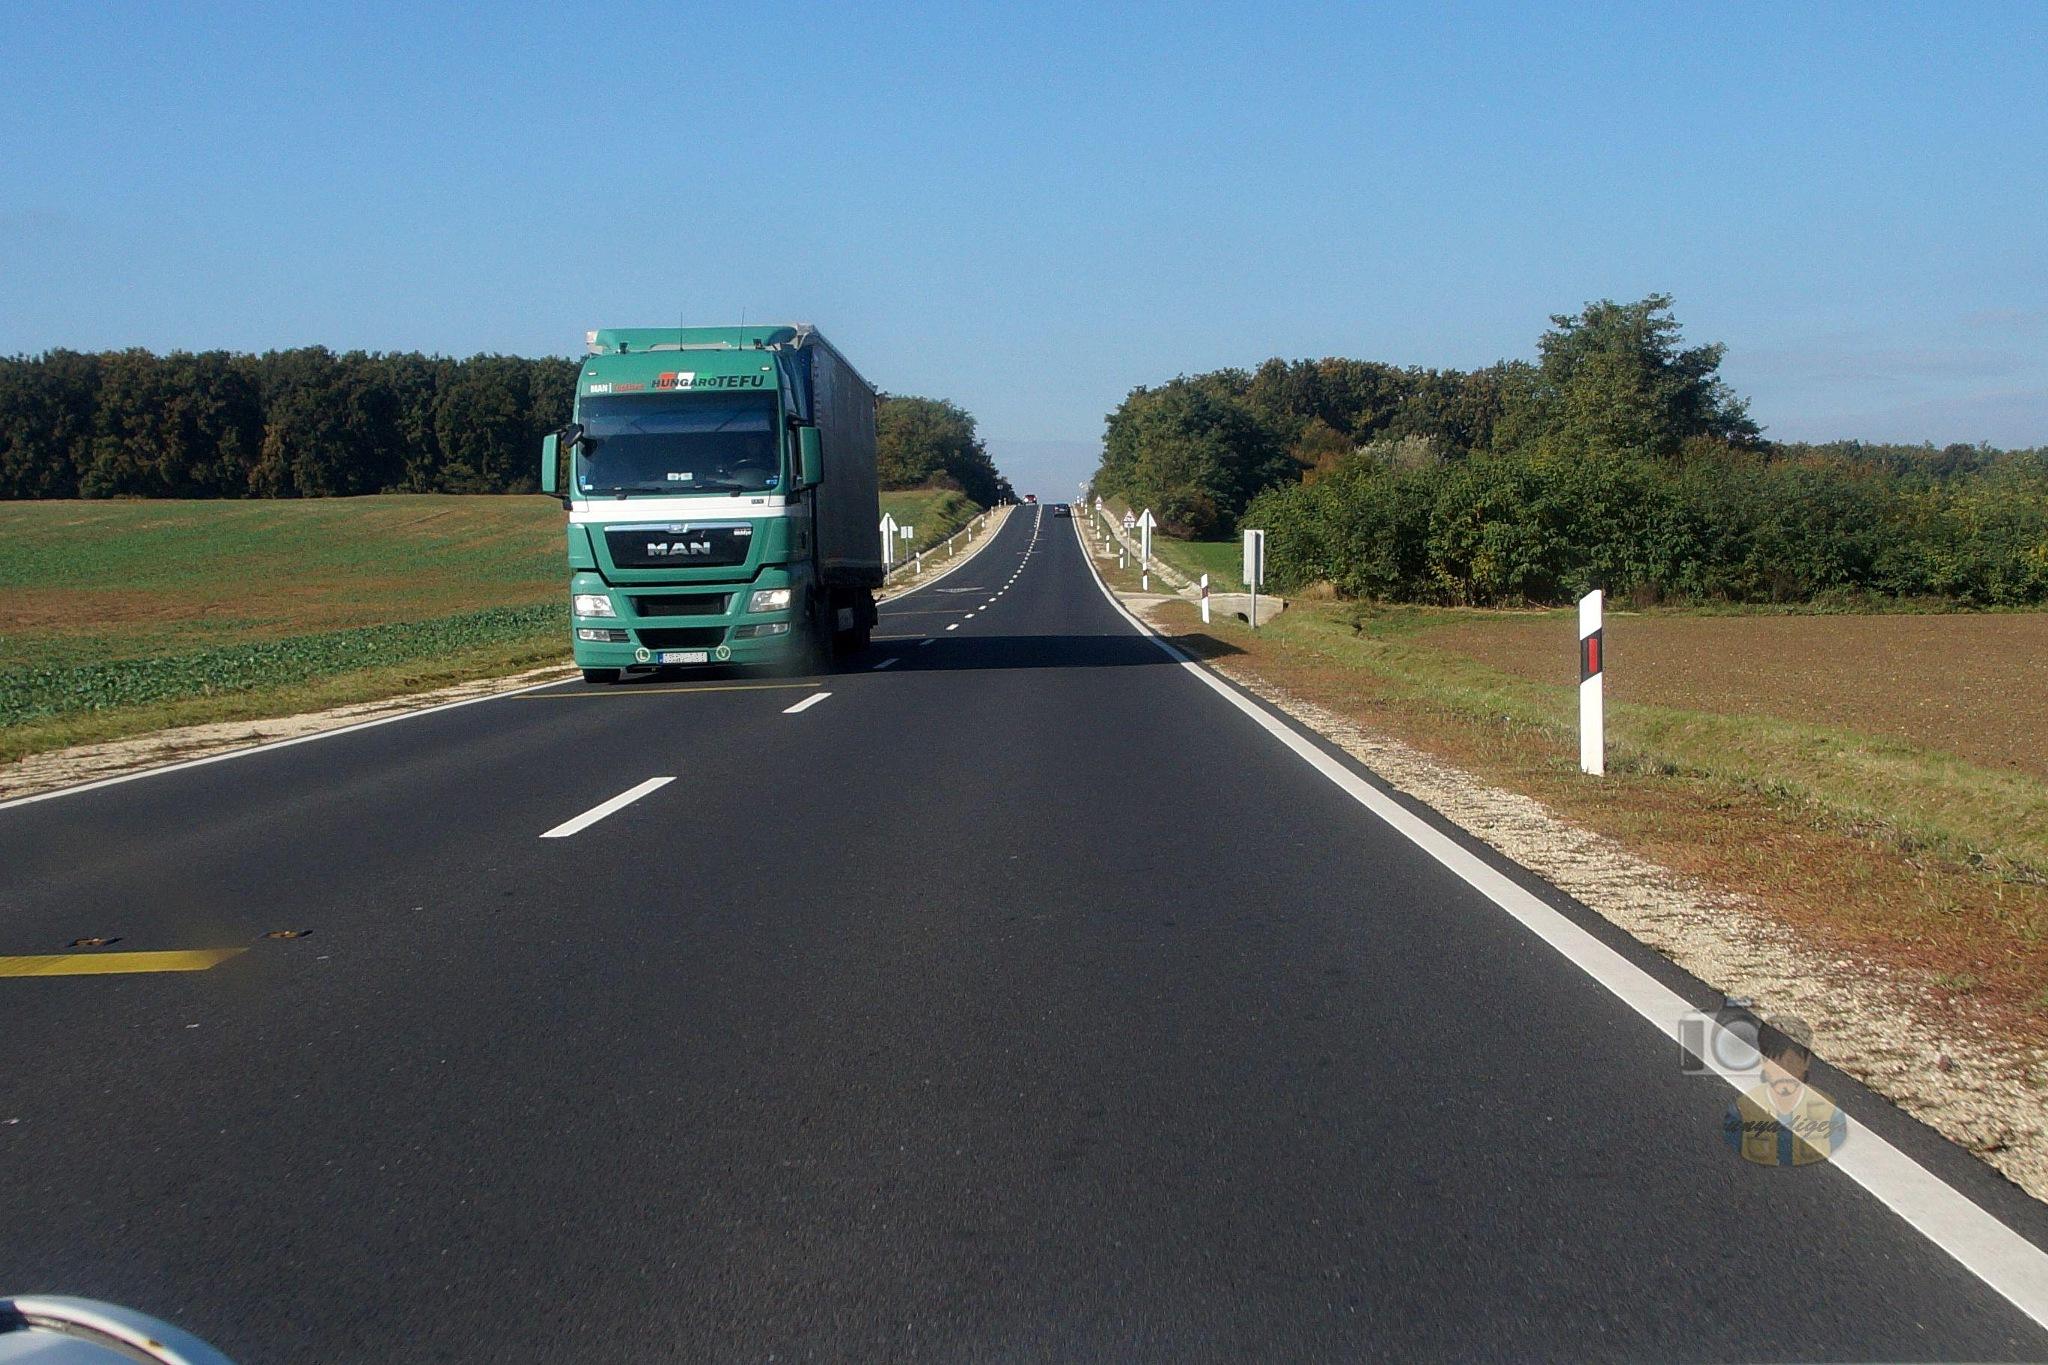 Oct.22, on road #1 by hunyadigeza